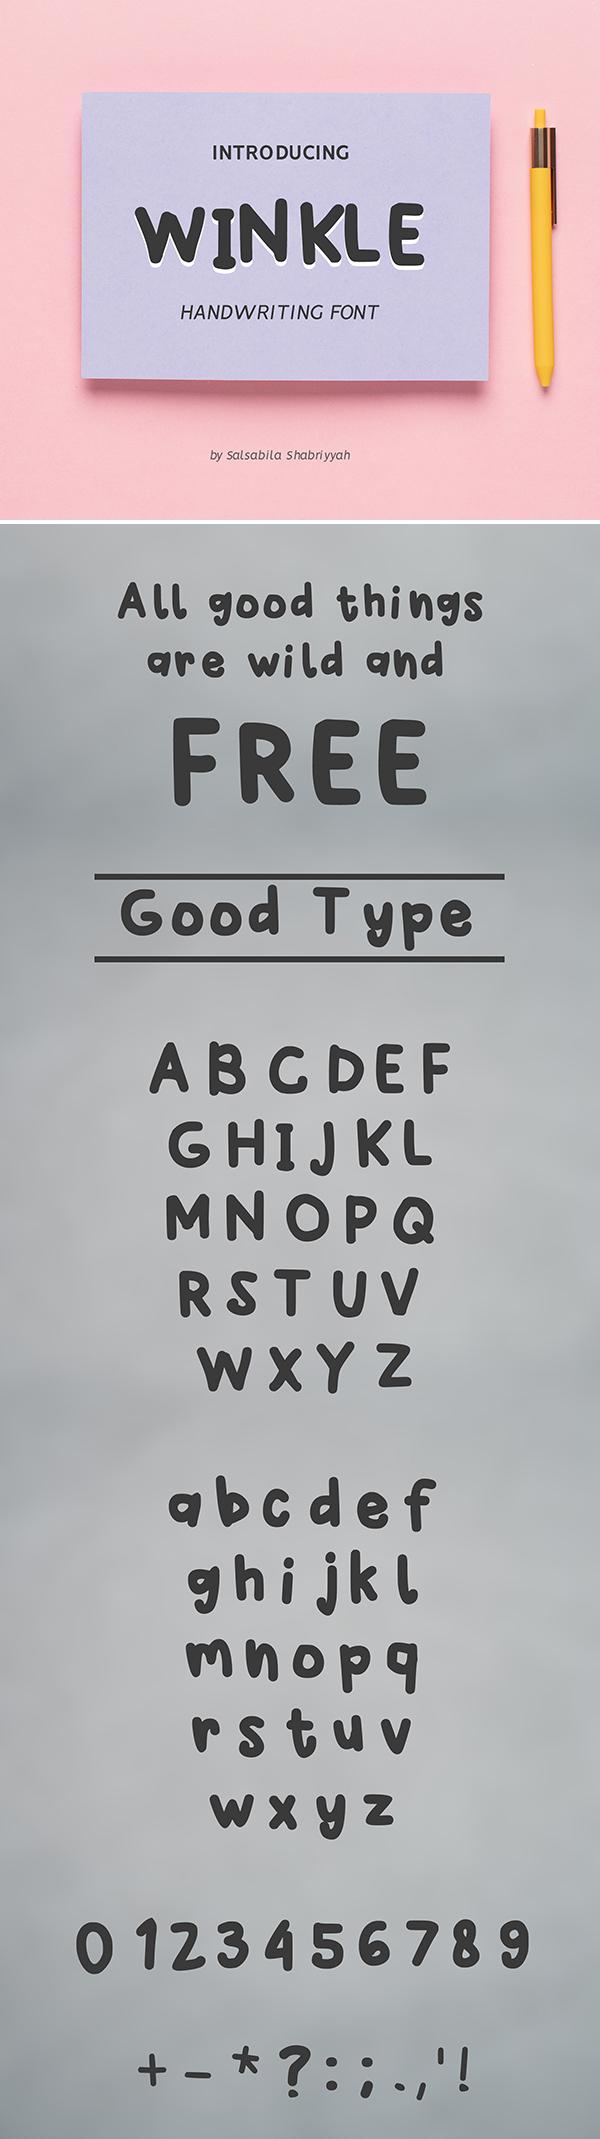 Winkle Handwriting Font